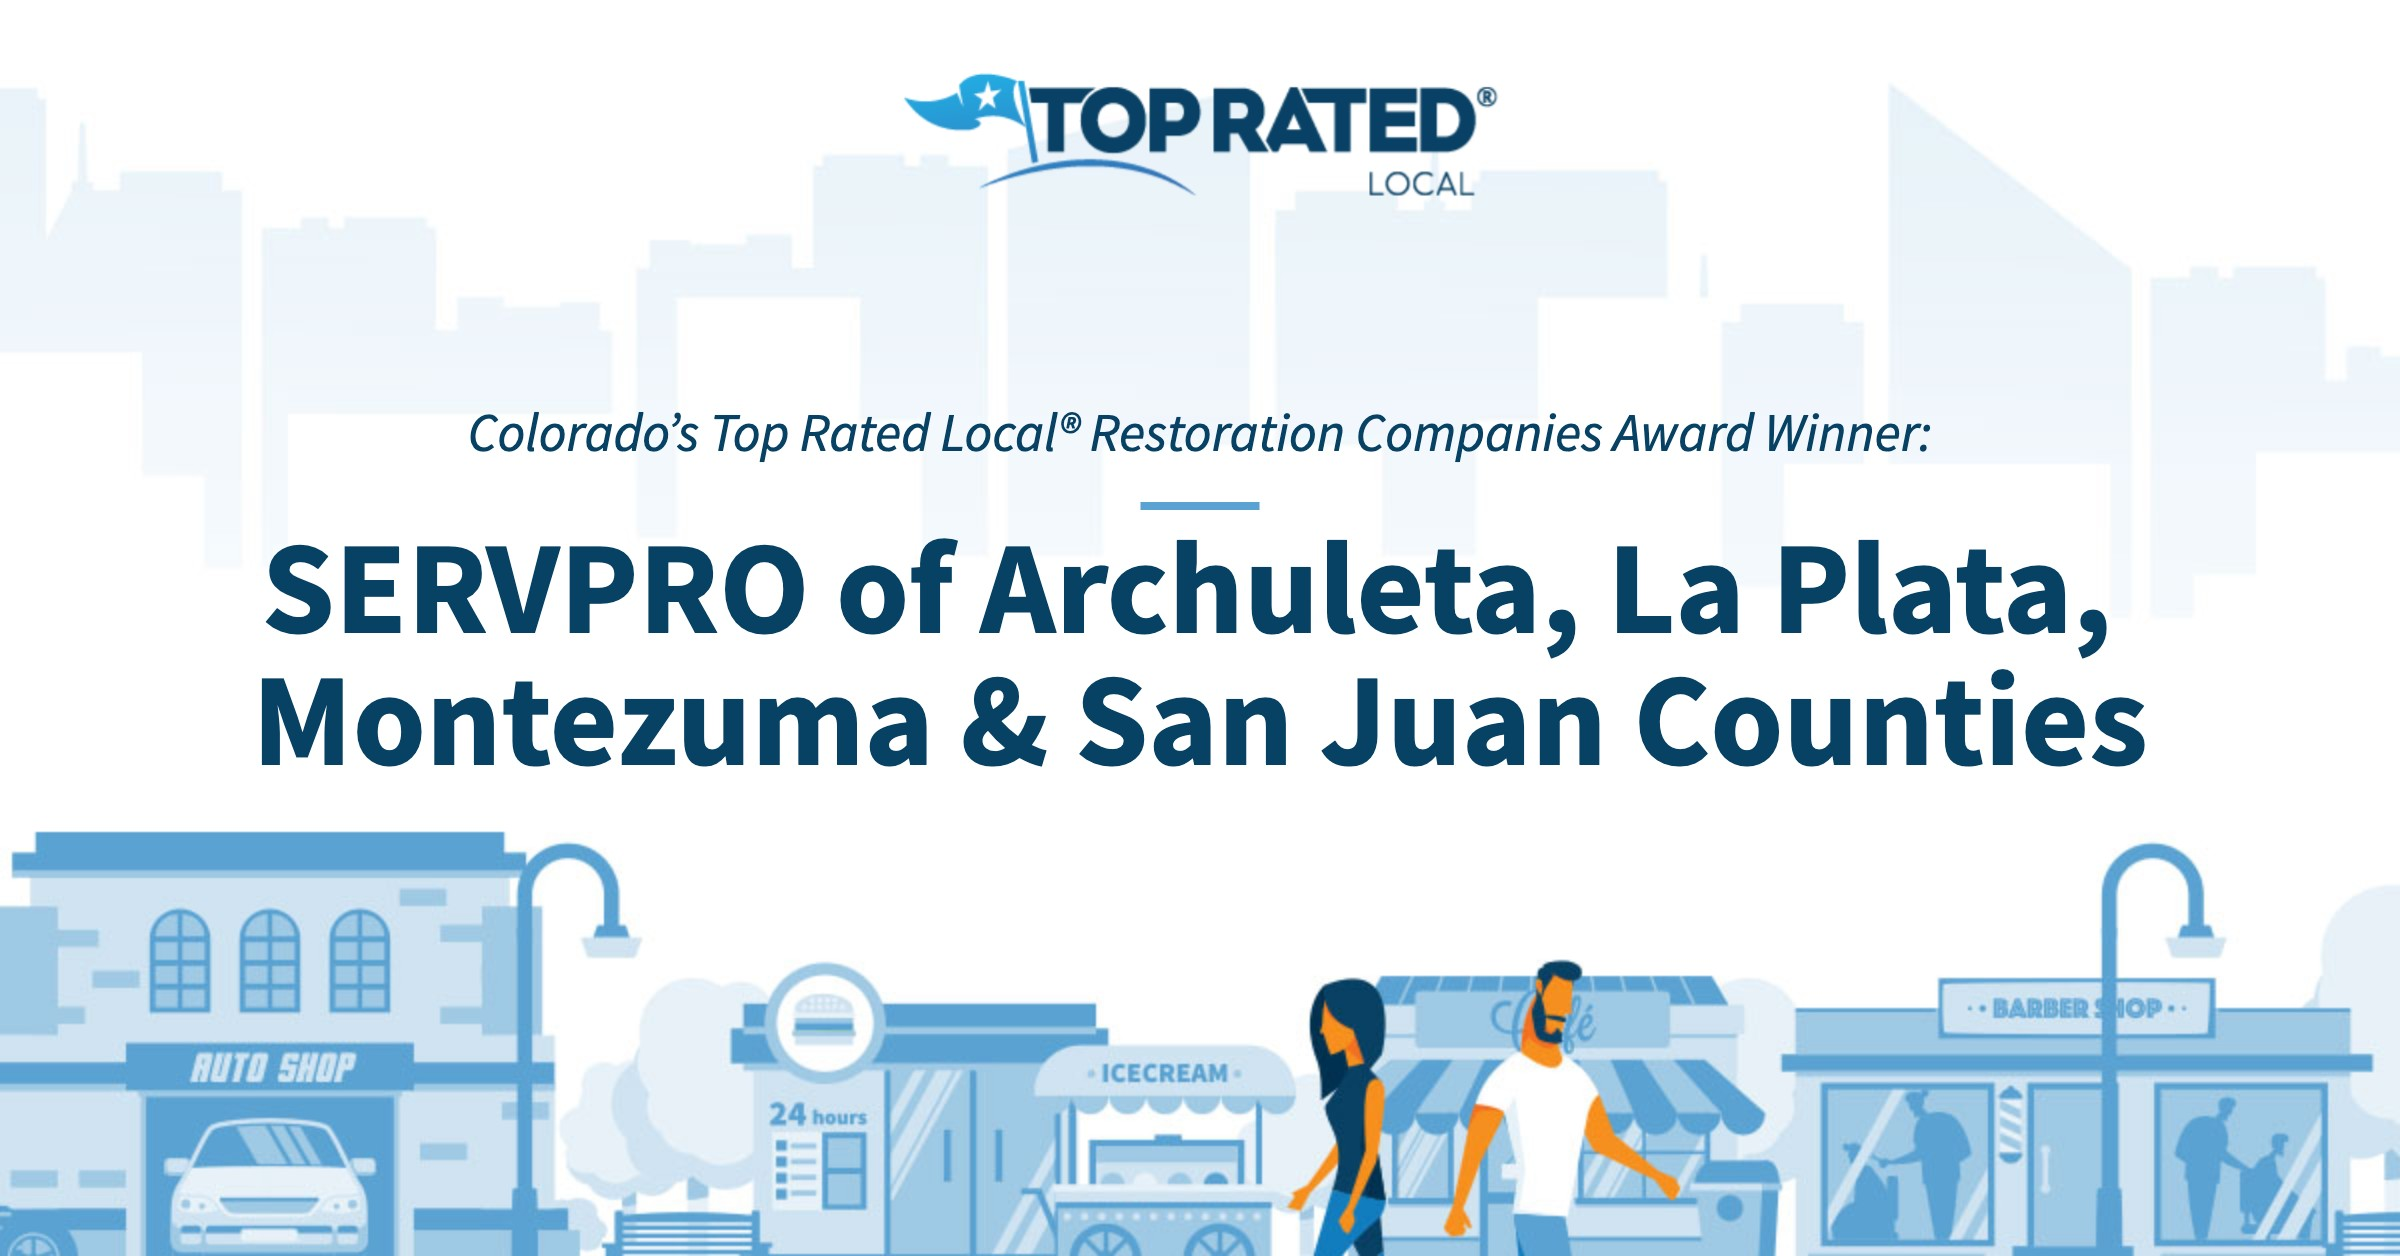 Colorado's Top Rated Local® Restoration Companies Award Winner: SERVPRO of Archuleta, La Plata, Montezuma & San Juan Counties